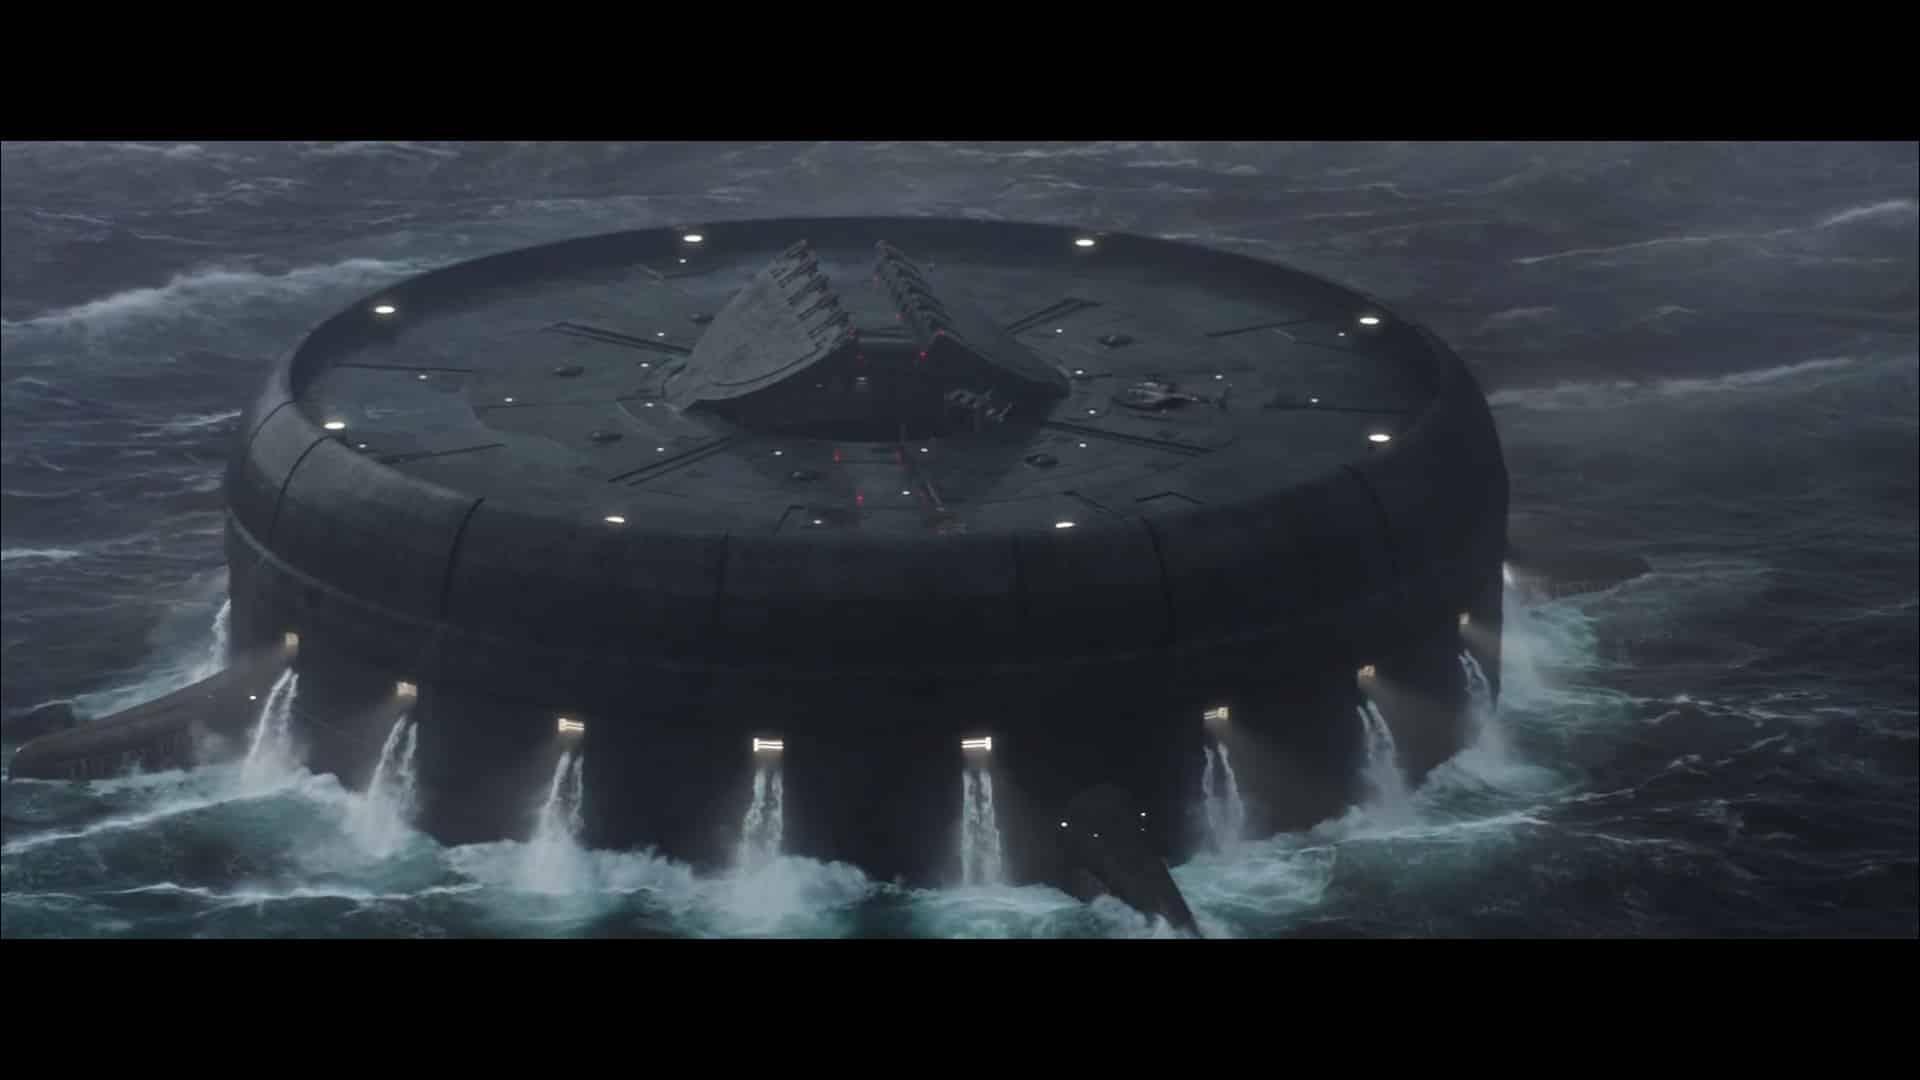 how to punish supervillains punishment court and prison options for legality: Zod in the Phantom Zone, Raft, Arkham Asylum, brainwashing